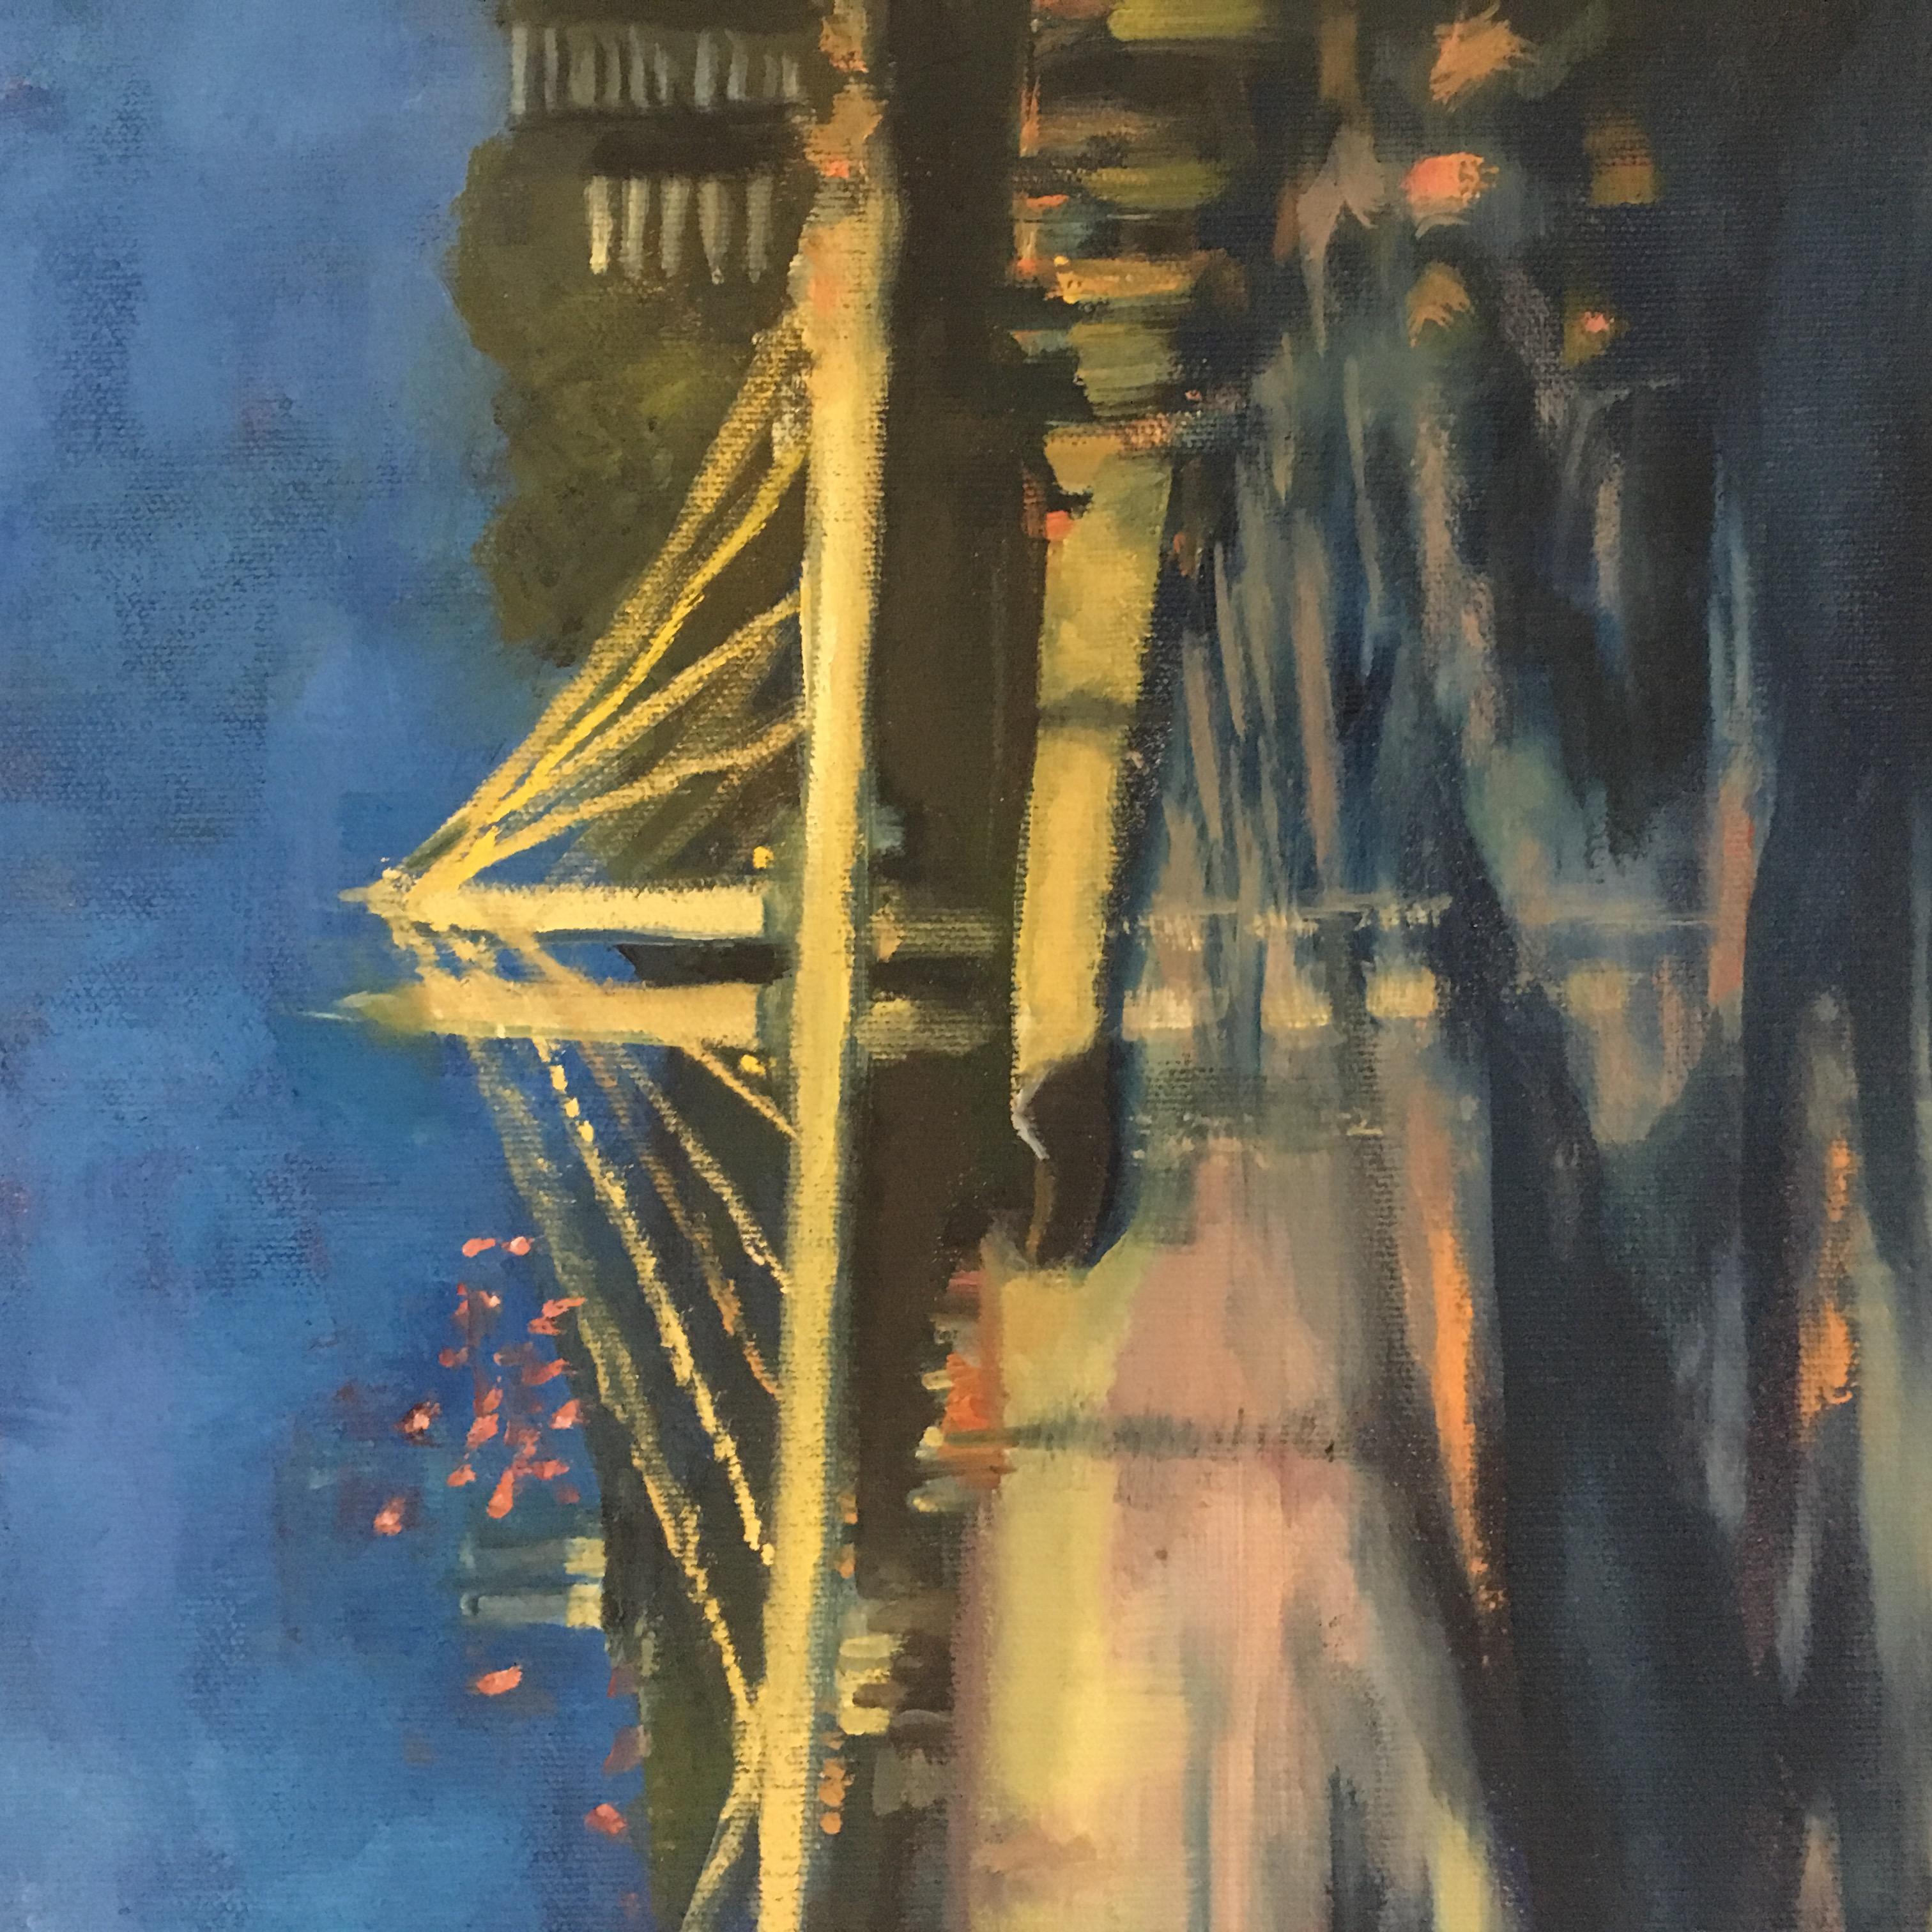 Albert Bridge at Dusk